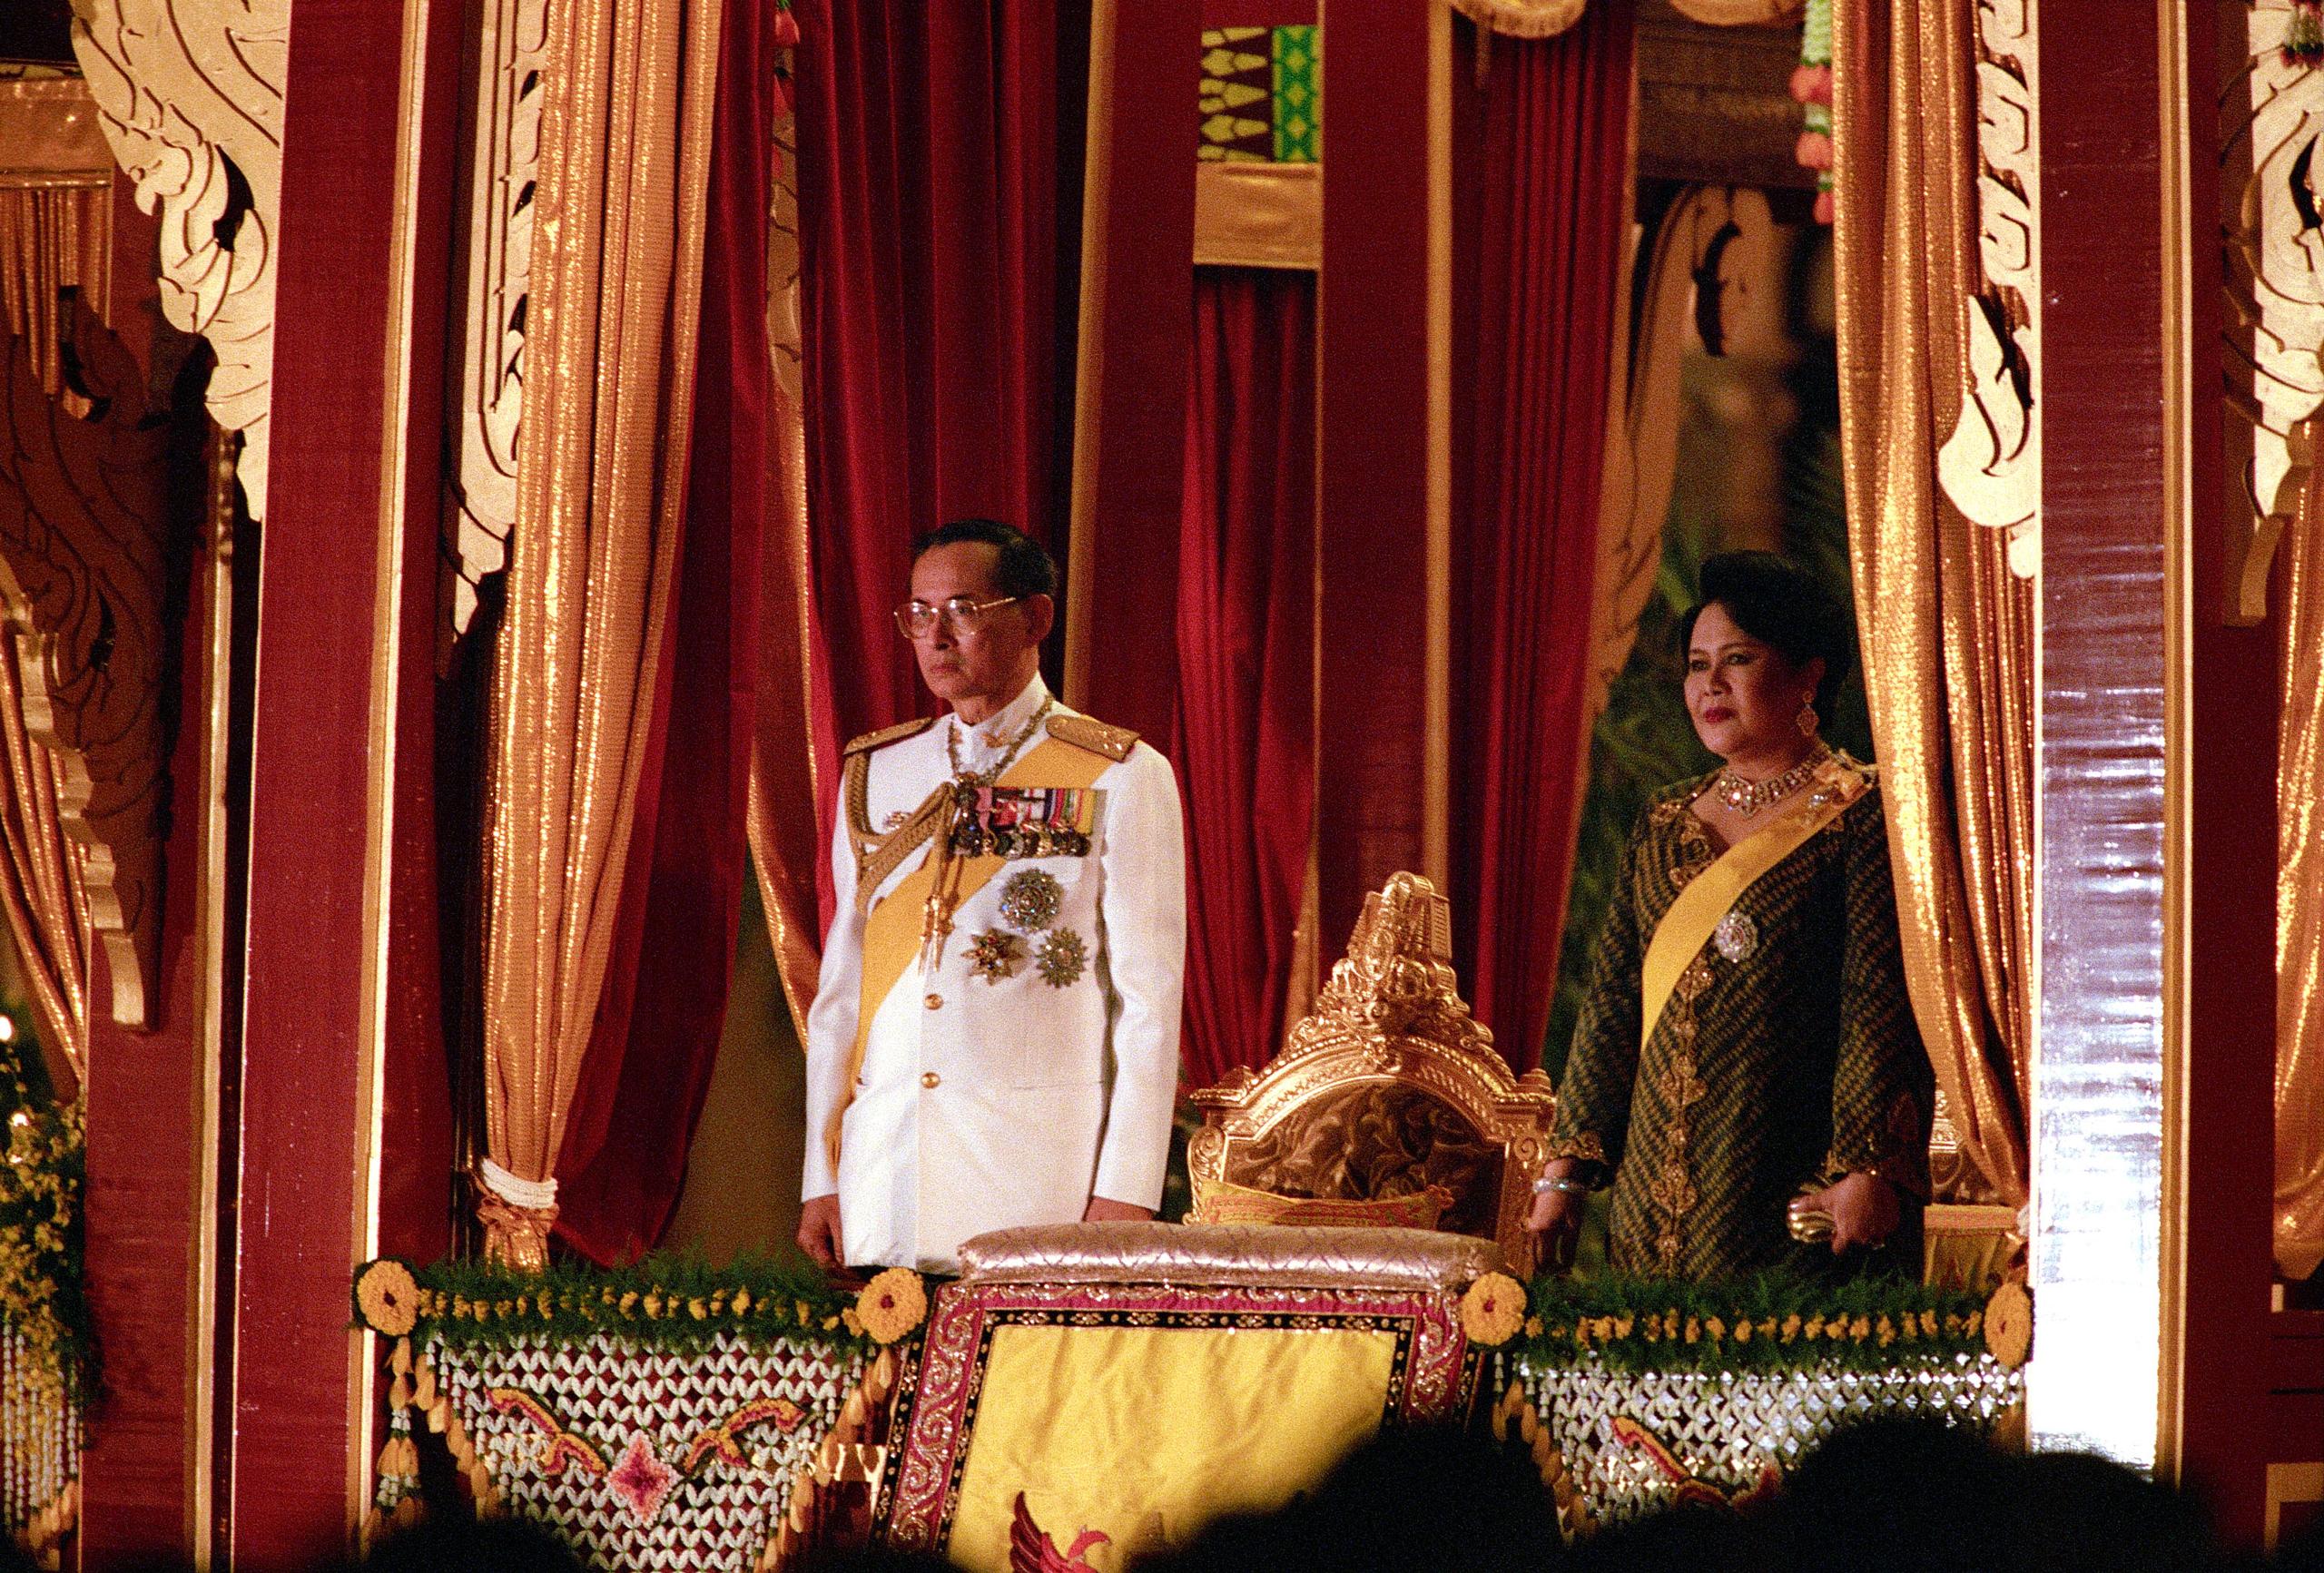 King Bhumibol Adulyadej and Queen Sirikit, in Bangkok on June 9, 1996